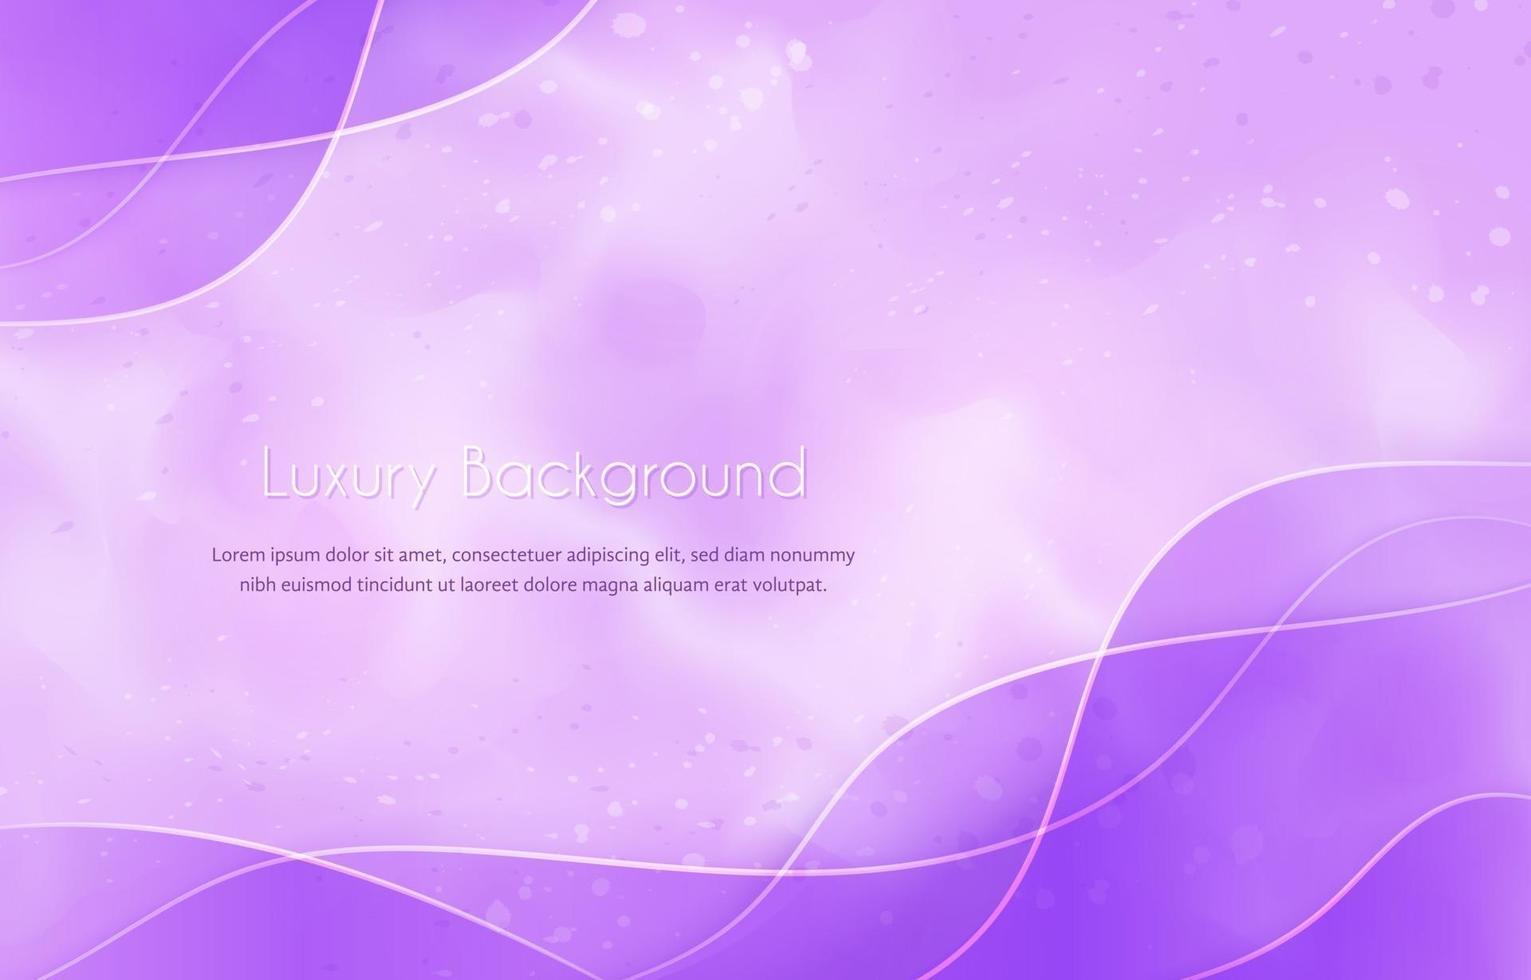 Beauty Wavy Levender Background vector